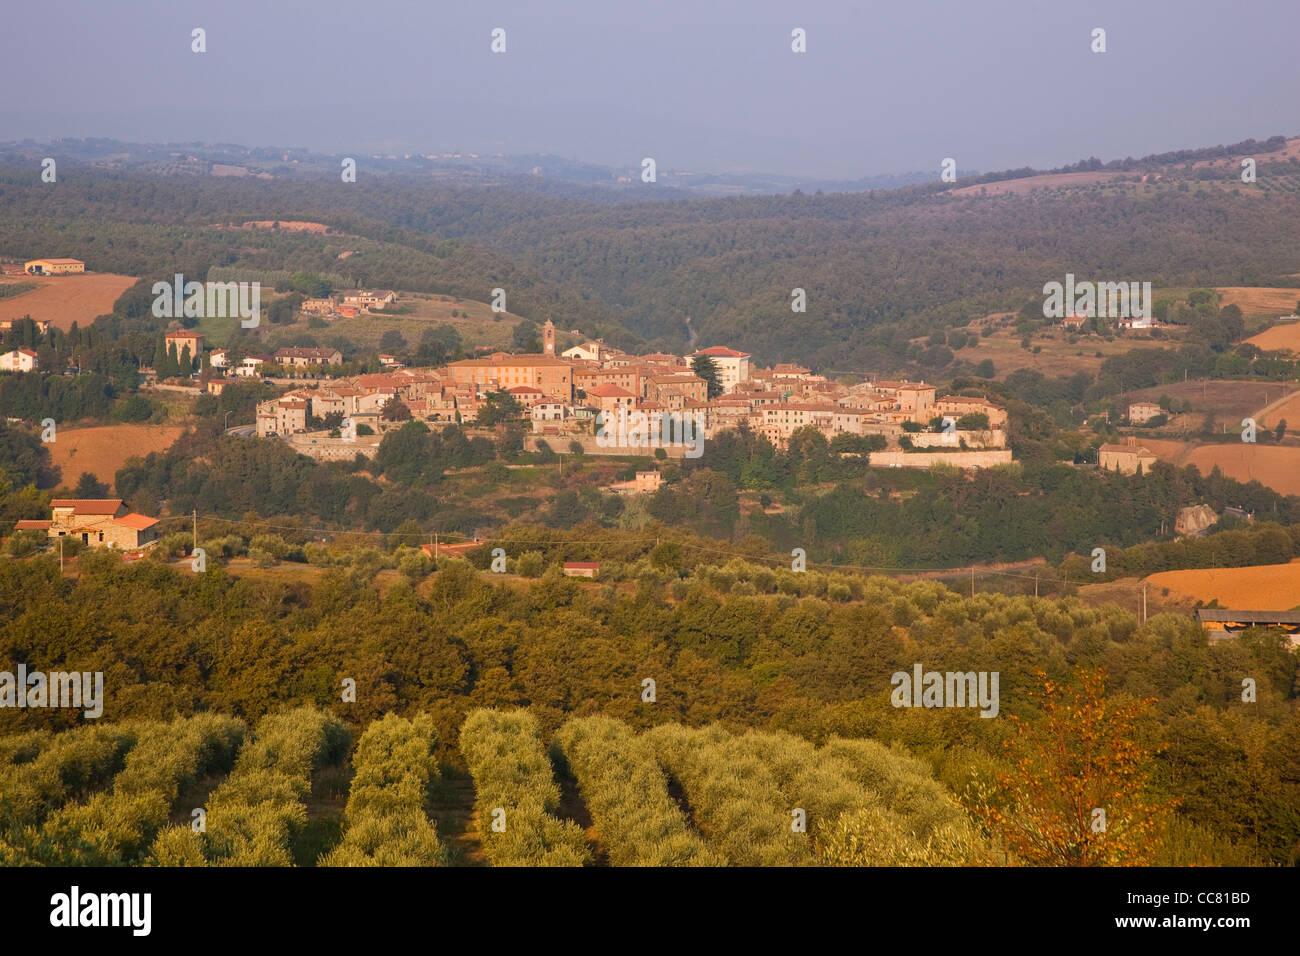 Piegaro, a hilltop village amid the rural Umbrian landscape, Province of Perugia, Umbria, Italy - Stock Image